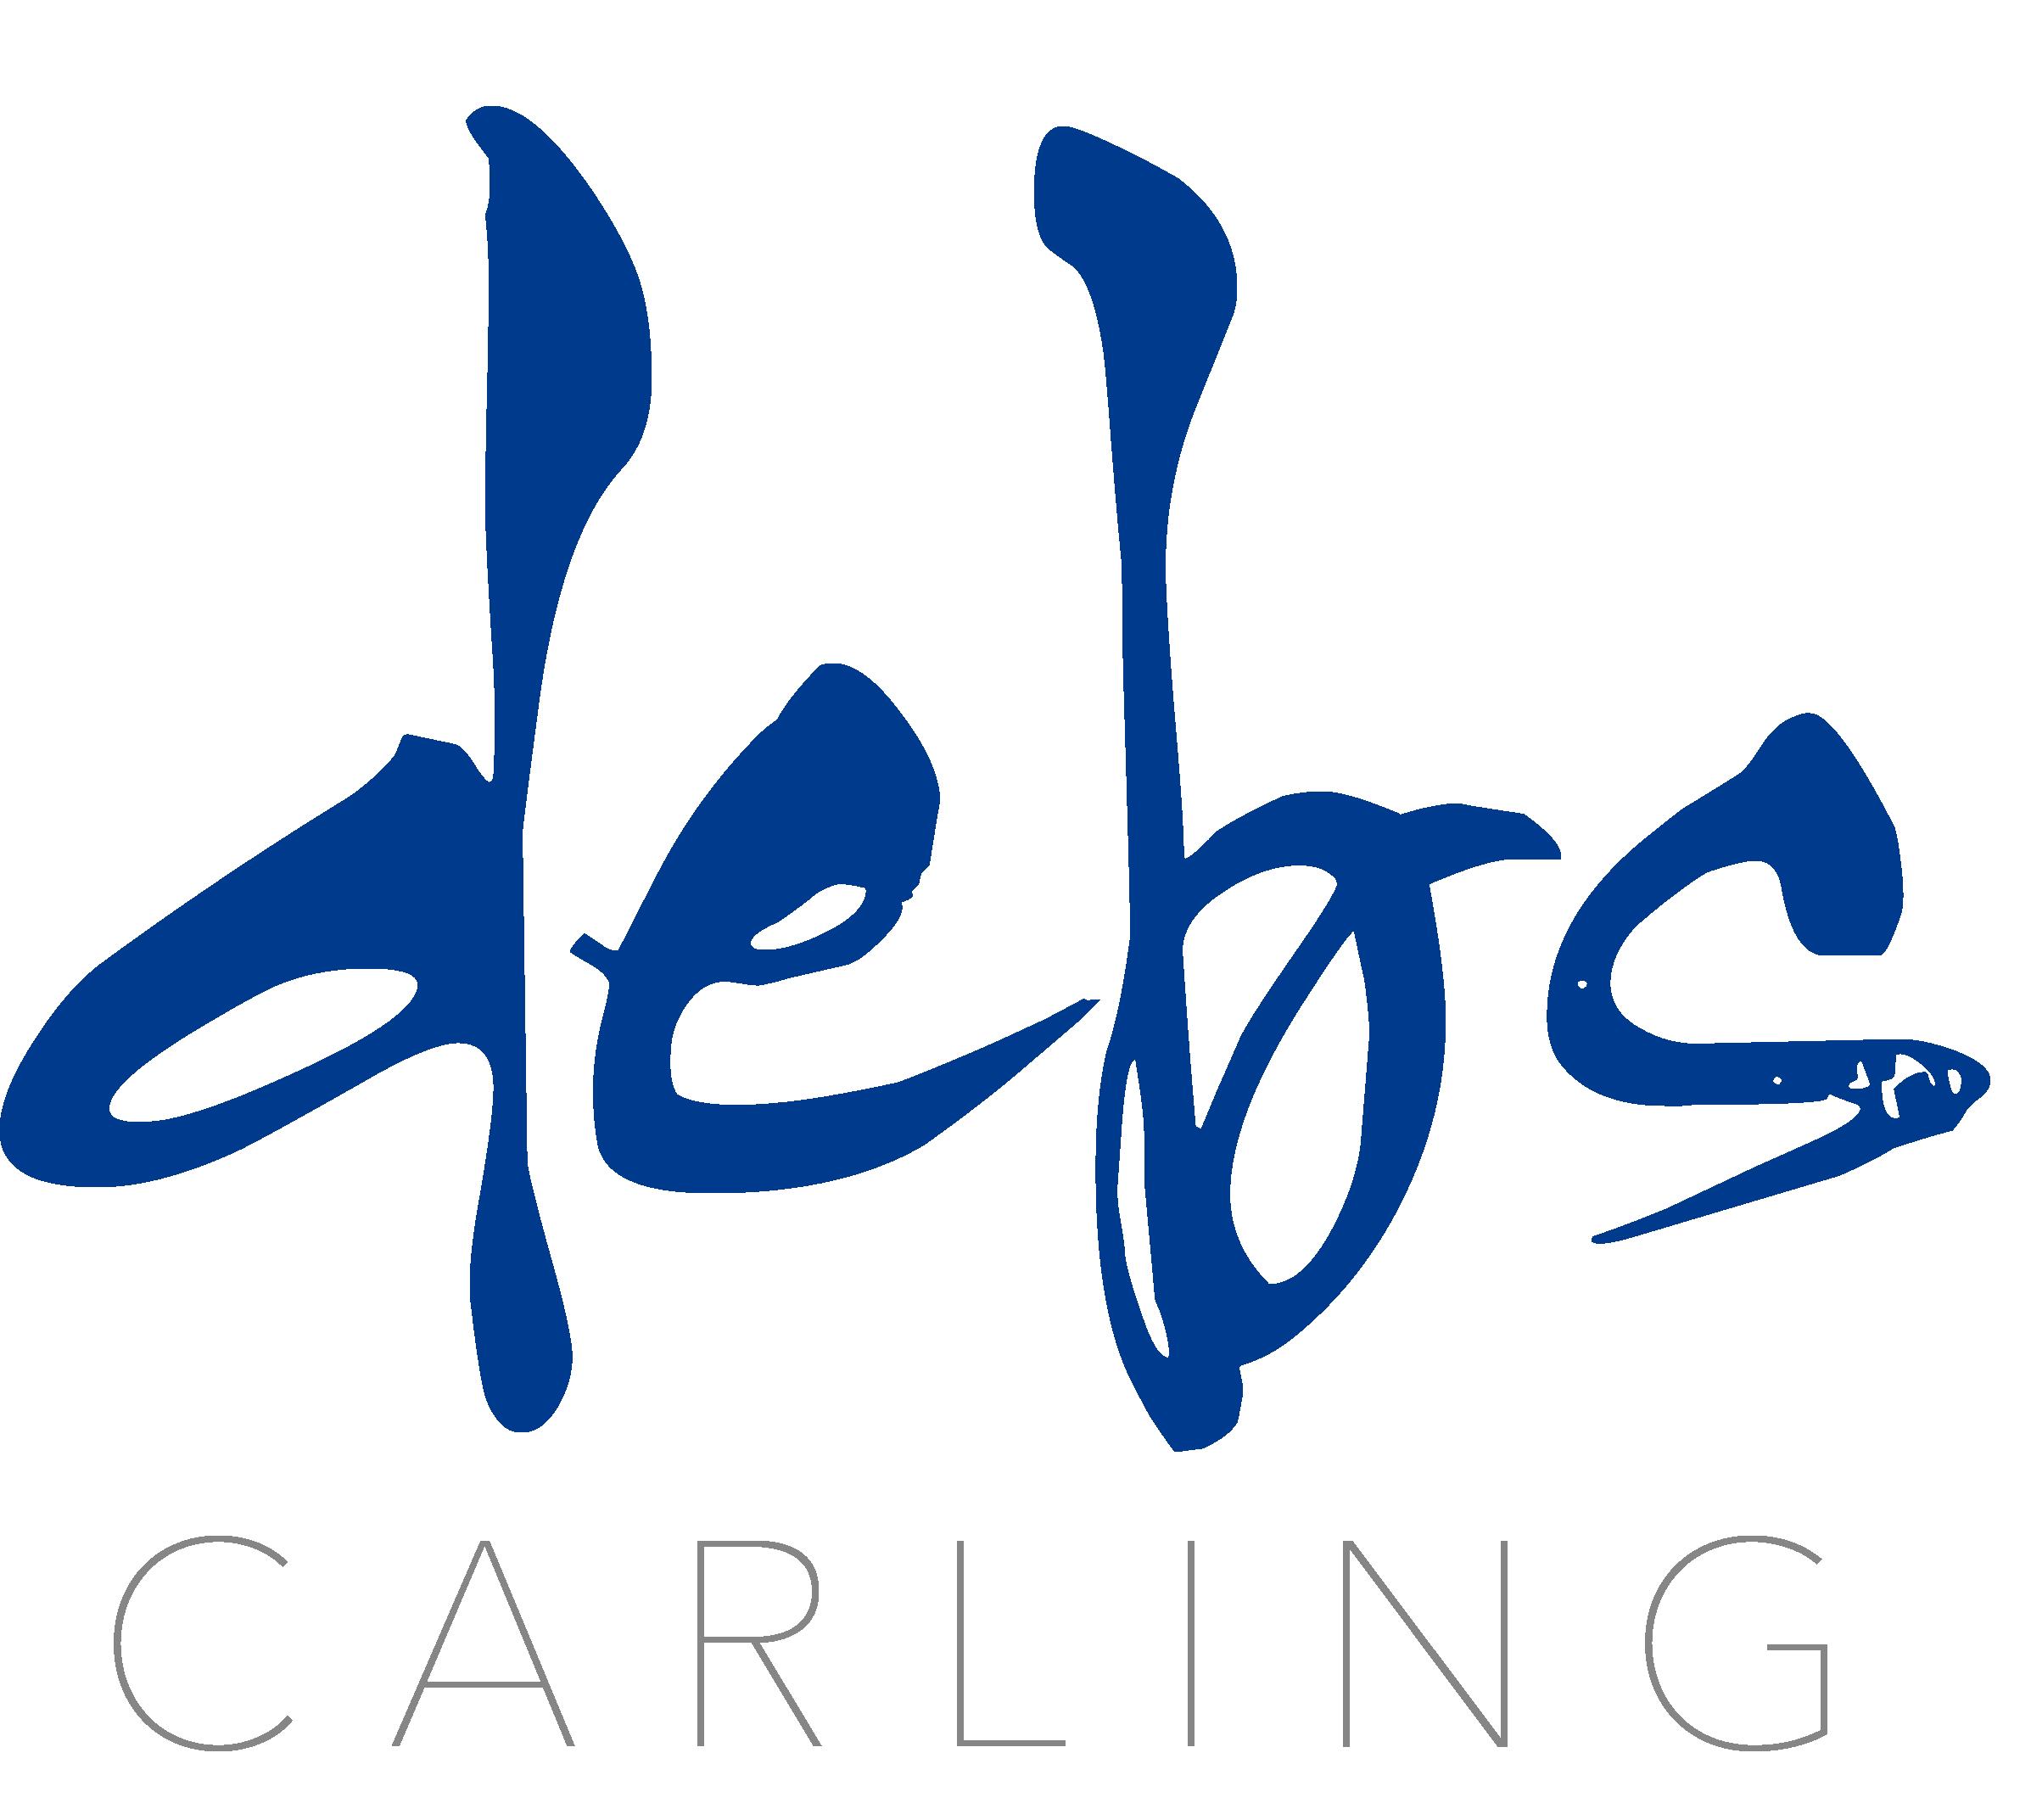 DC dark logo